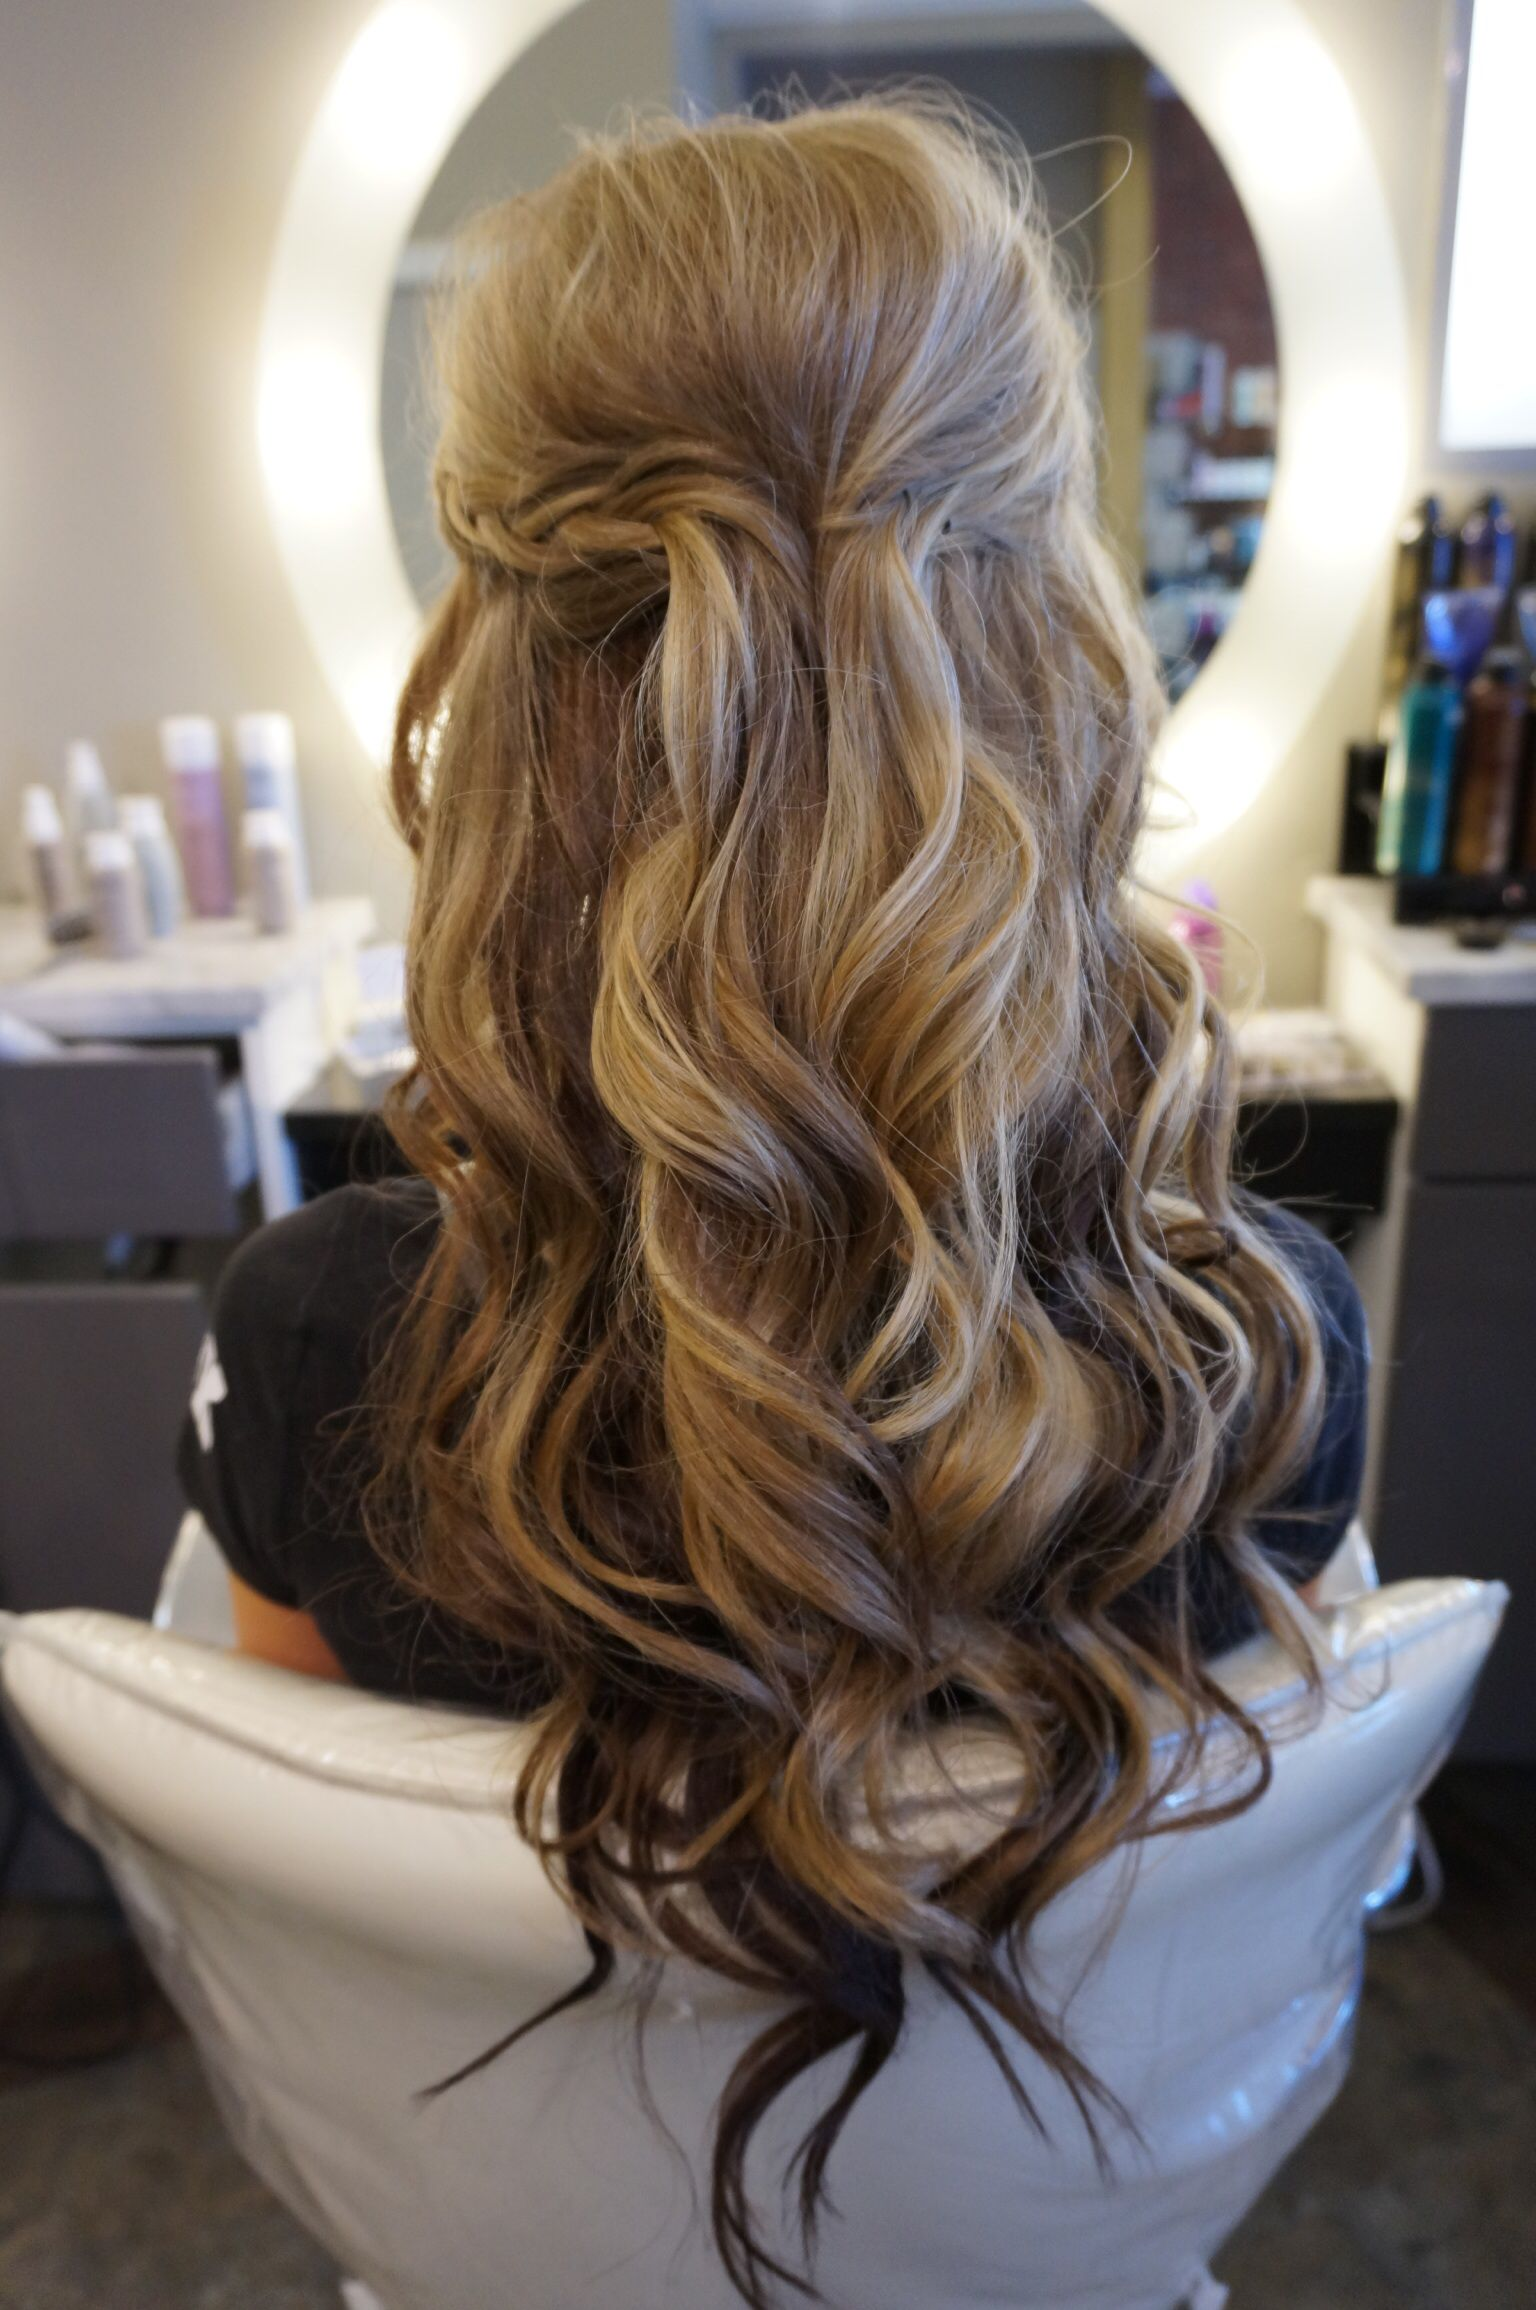 Pleasant Braided Half Up Half Up Half Down And Down Hairstyles On Pinterest Short Hairstyles Gunalazisus